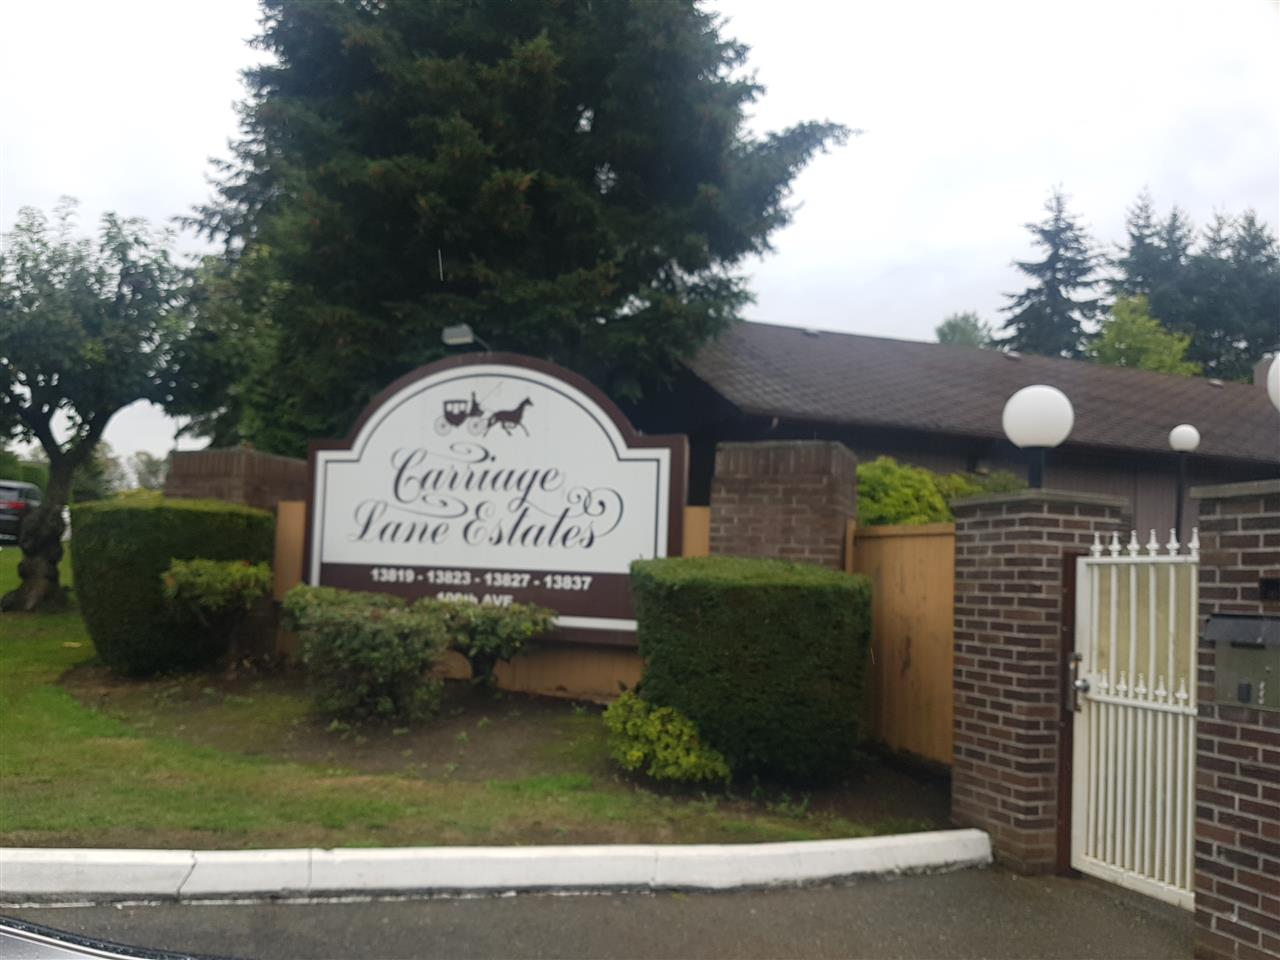 Buliding: 13827 100 Avenue, Surrey, BC